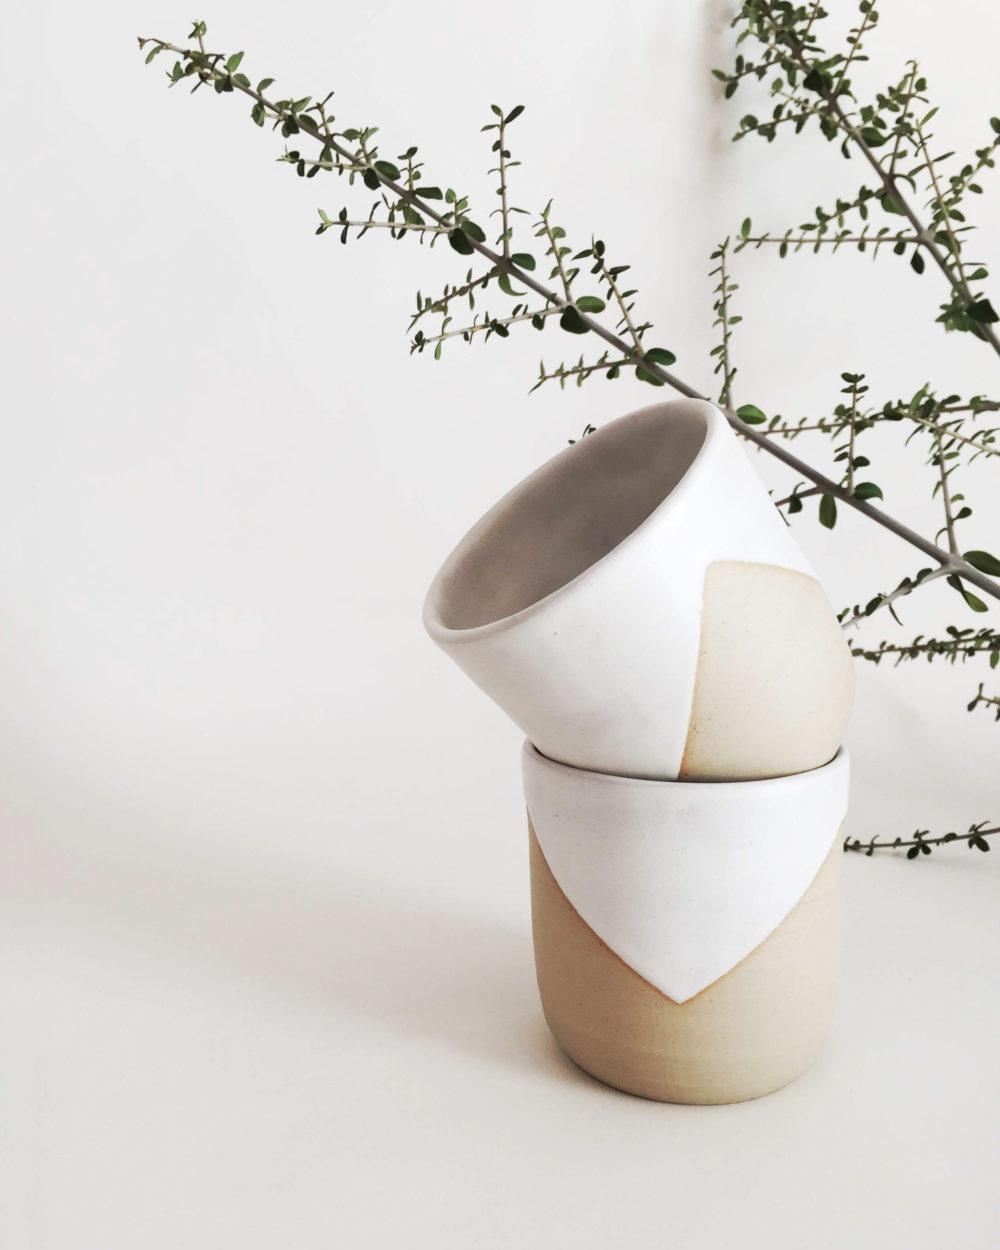 Ceràmica minimalista